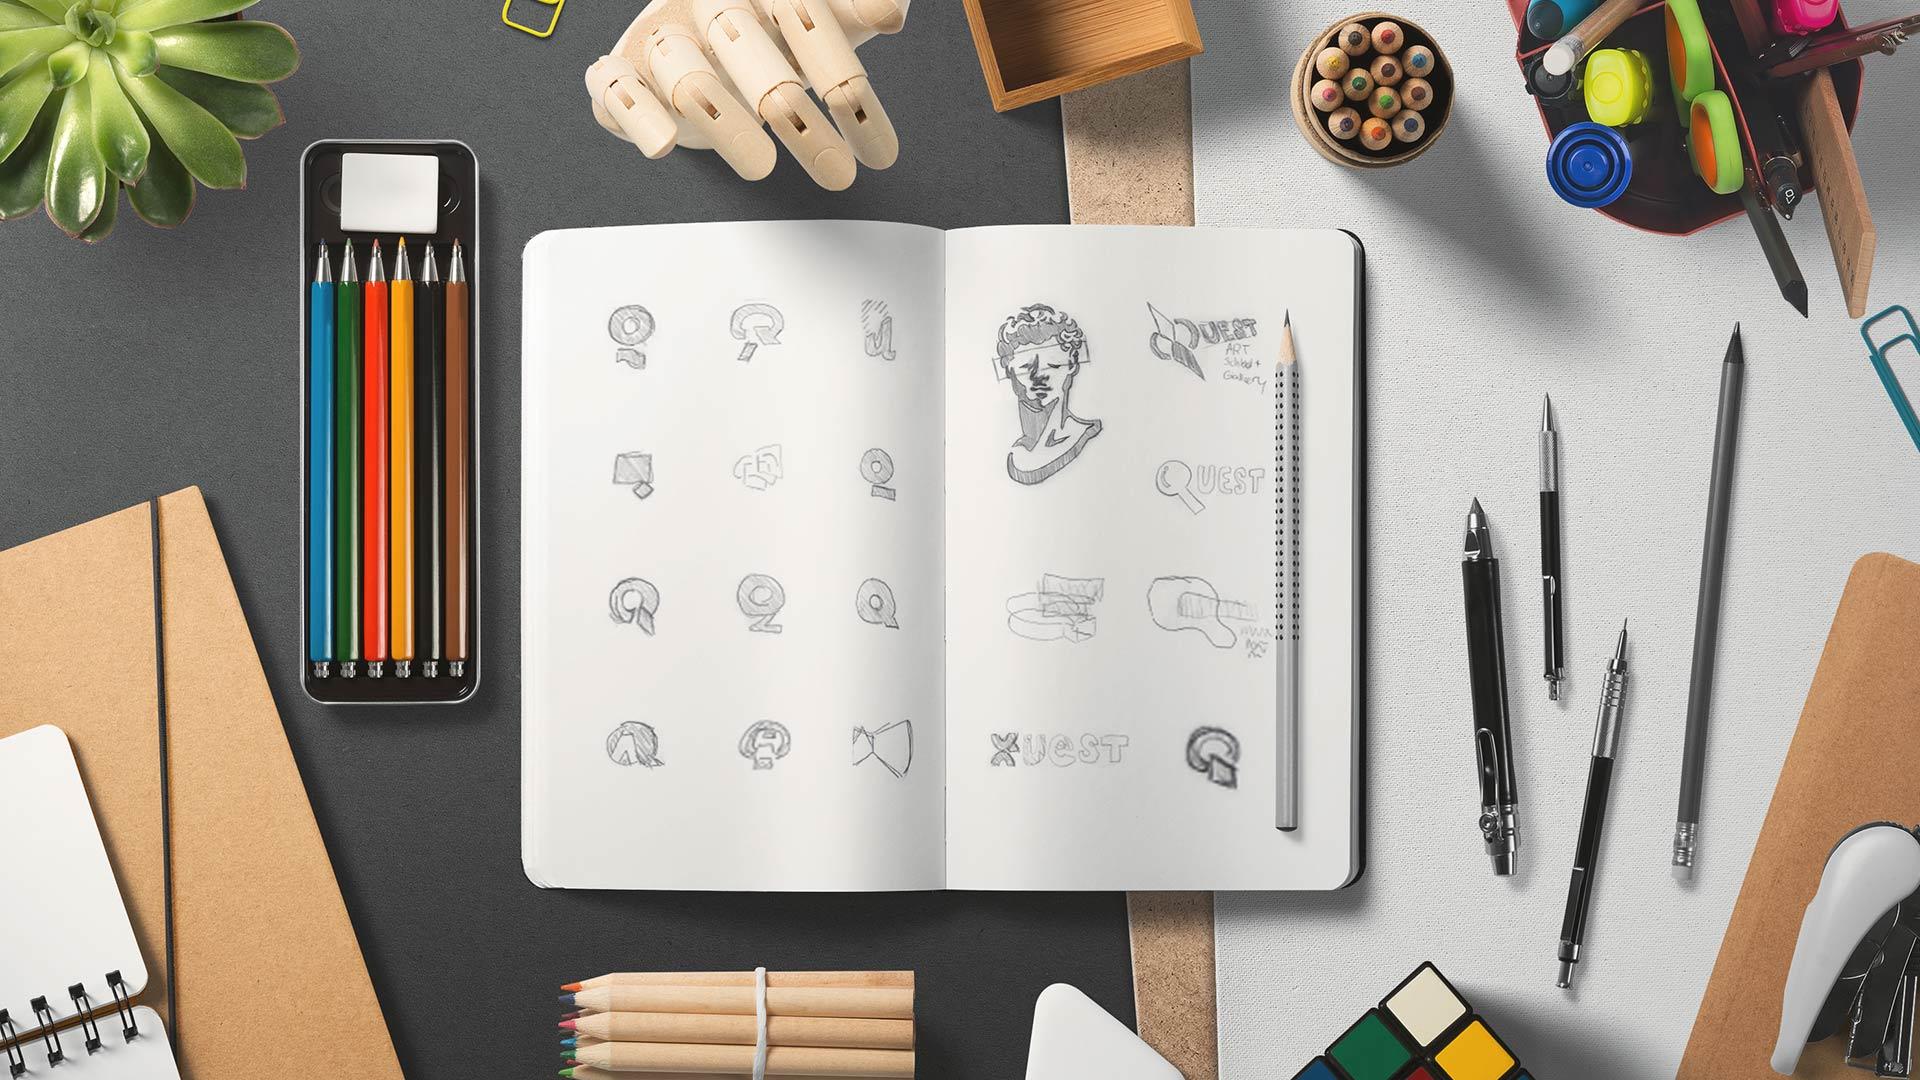 quest art logo sketches in sketch book